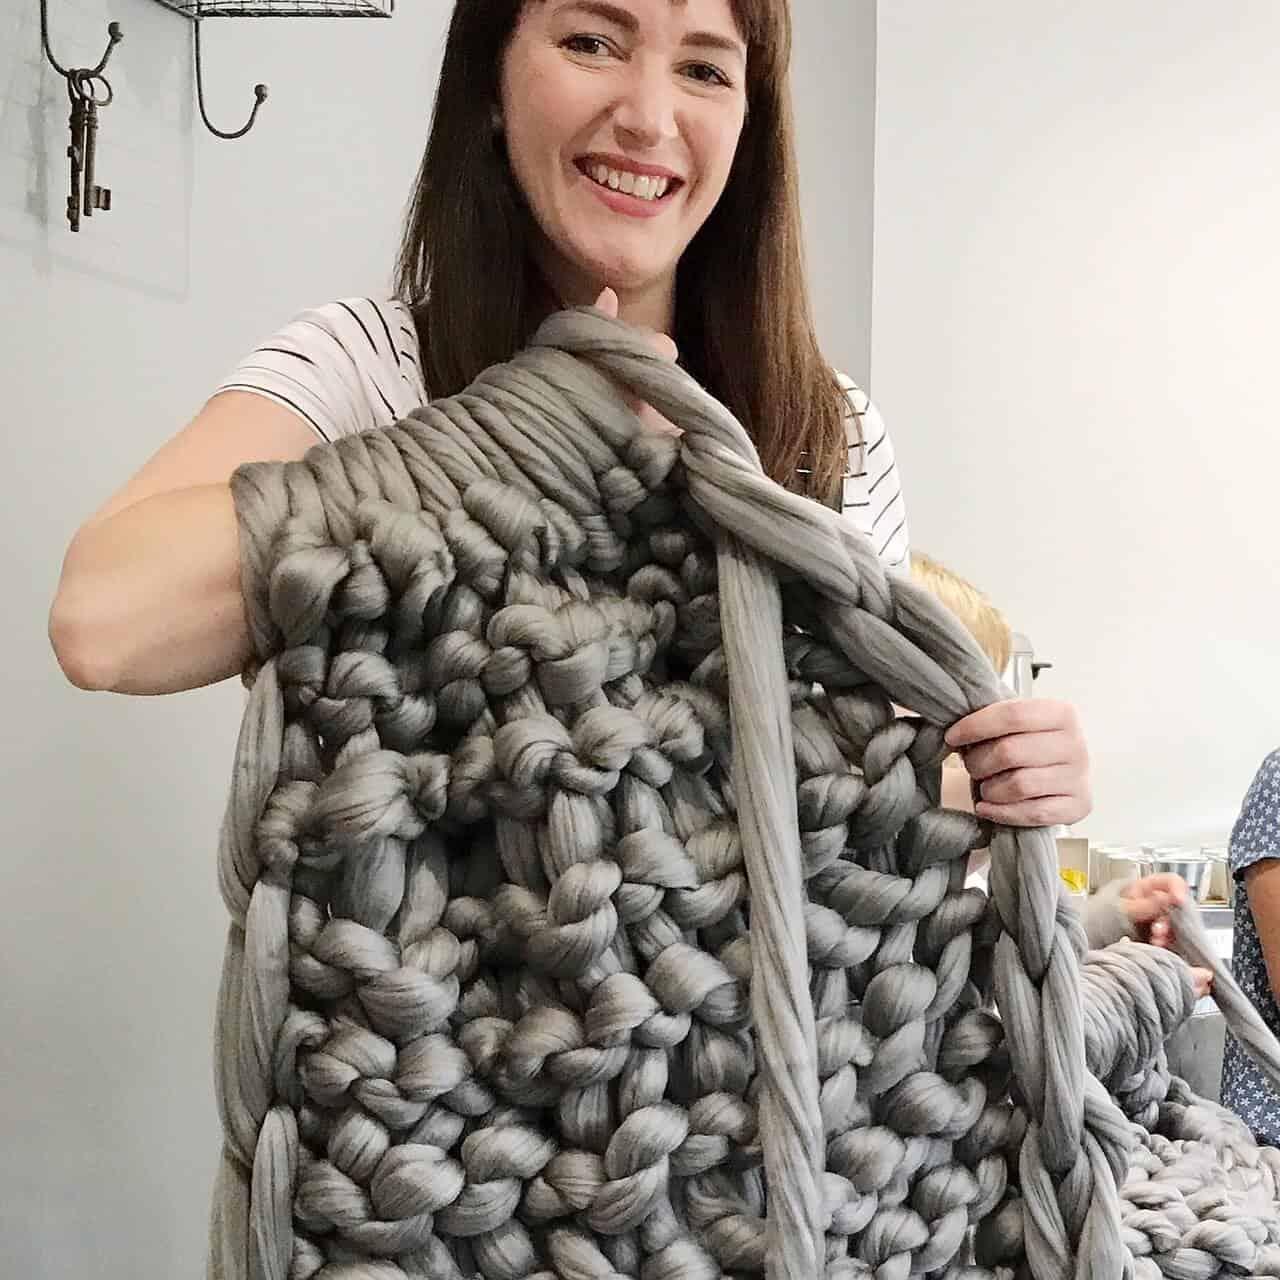 Becky Pink Arm Knitting a Throw